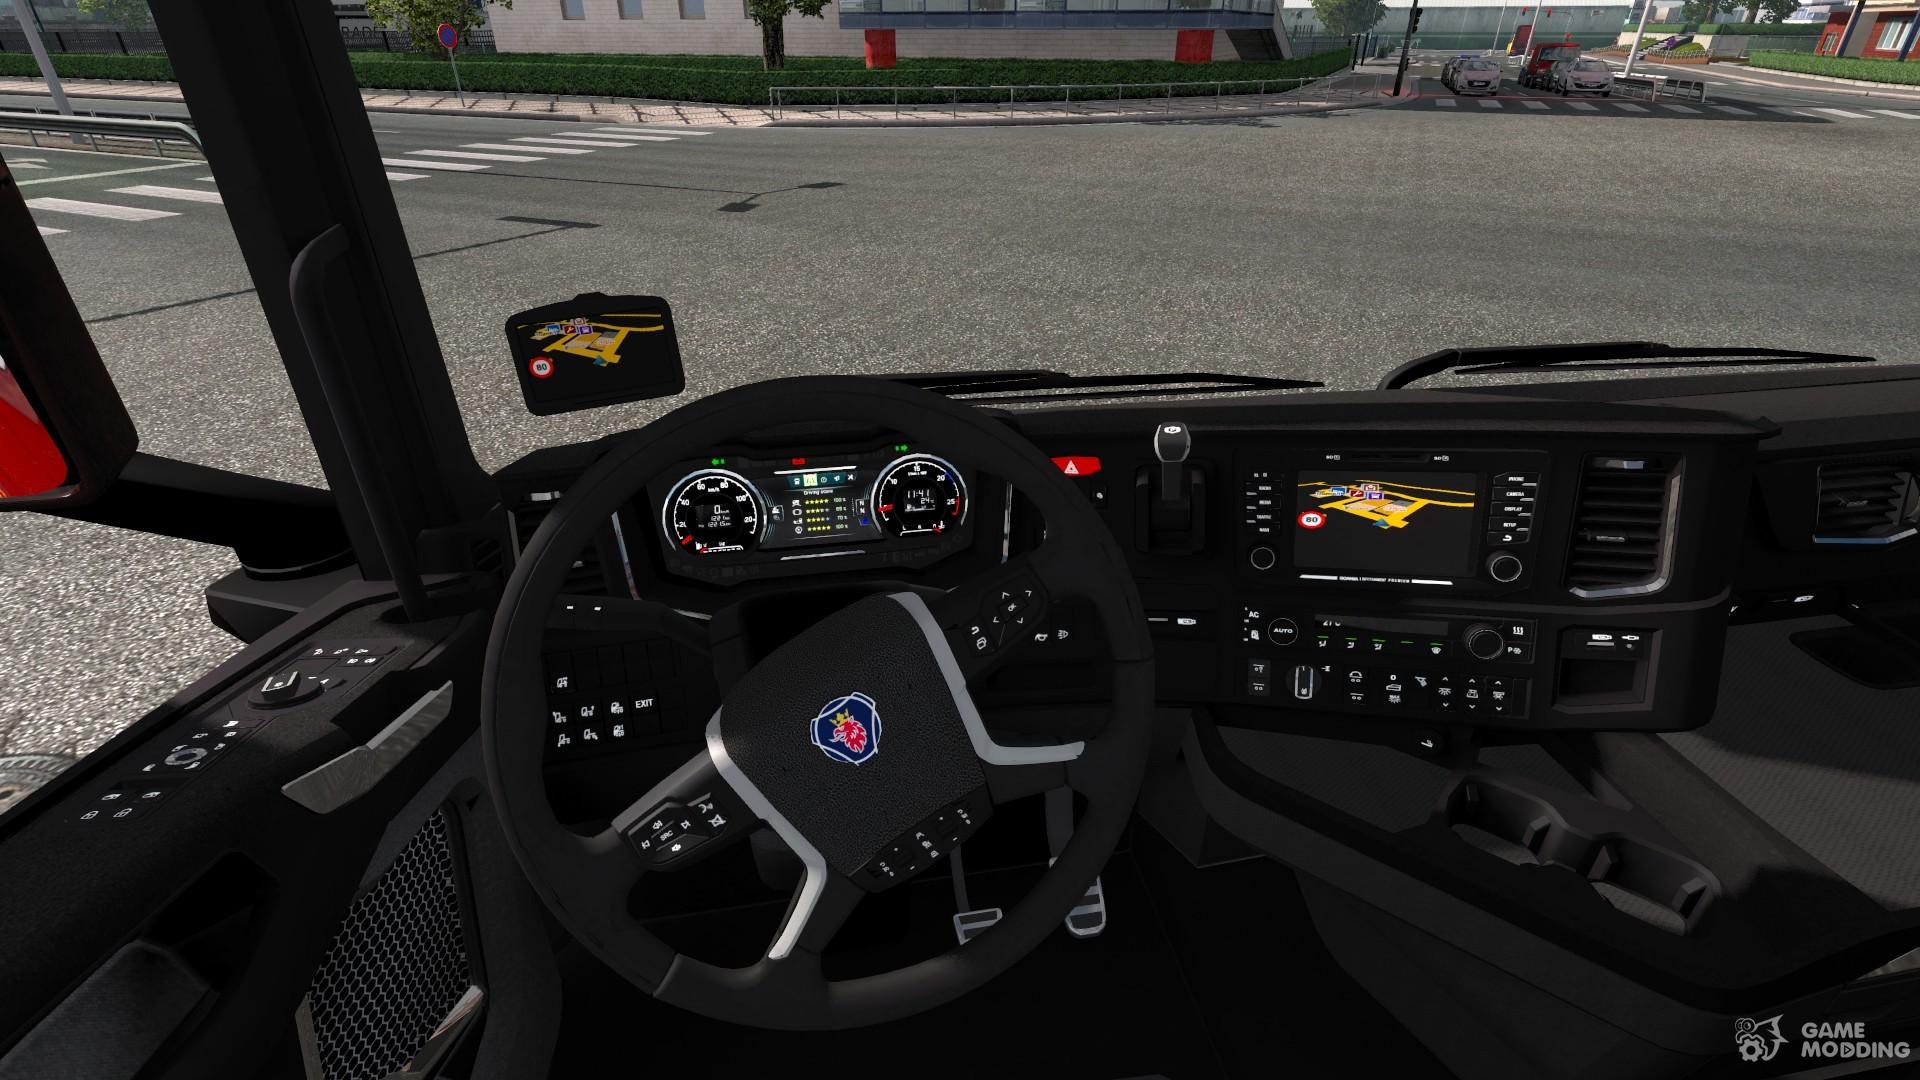 Scania S730 NextGen for Euro Truck Simulator 2